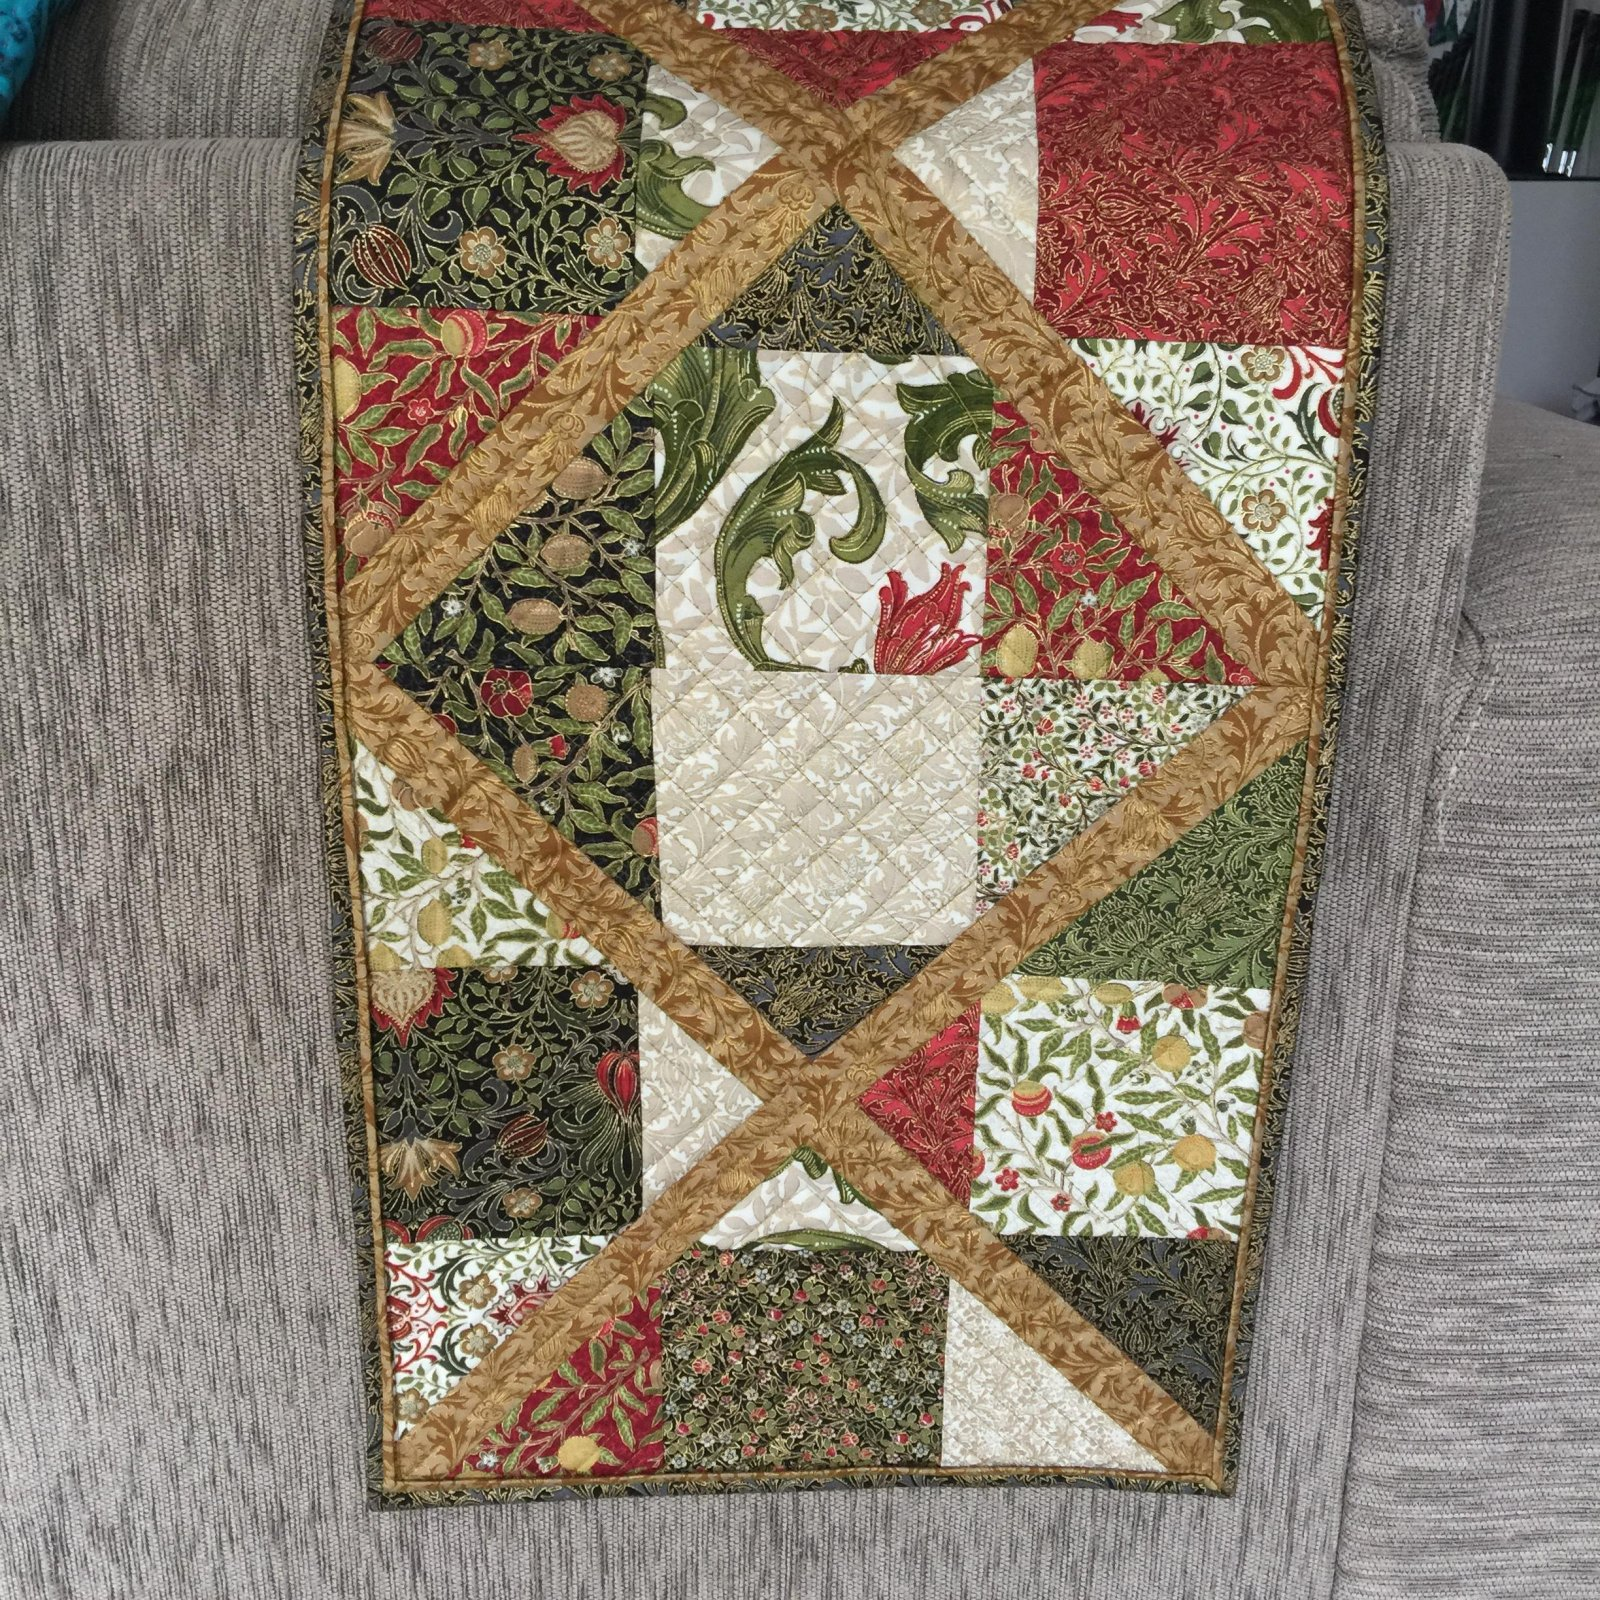 Nine Patch Crossings Table Runner Kit - Morris Holiday